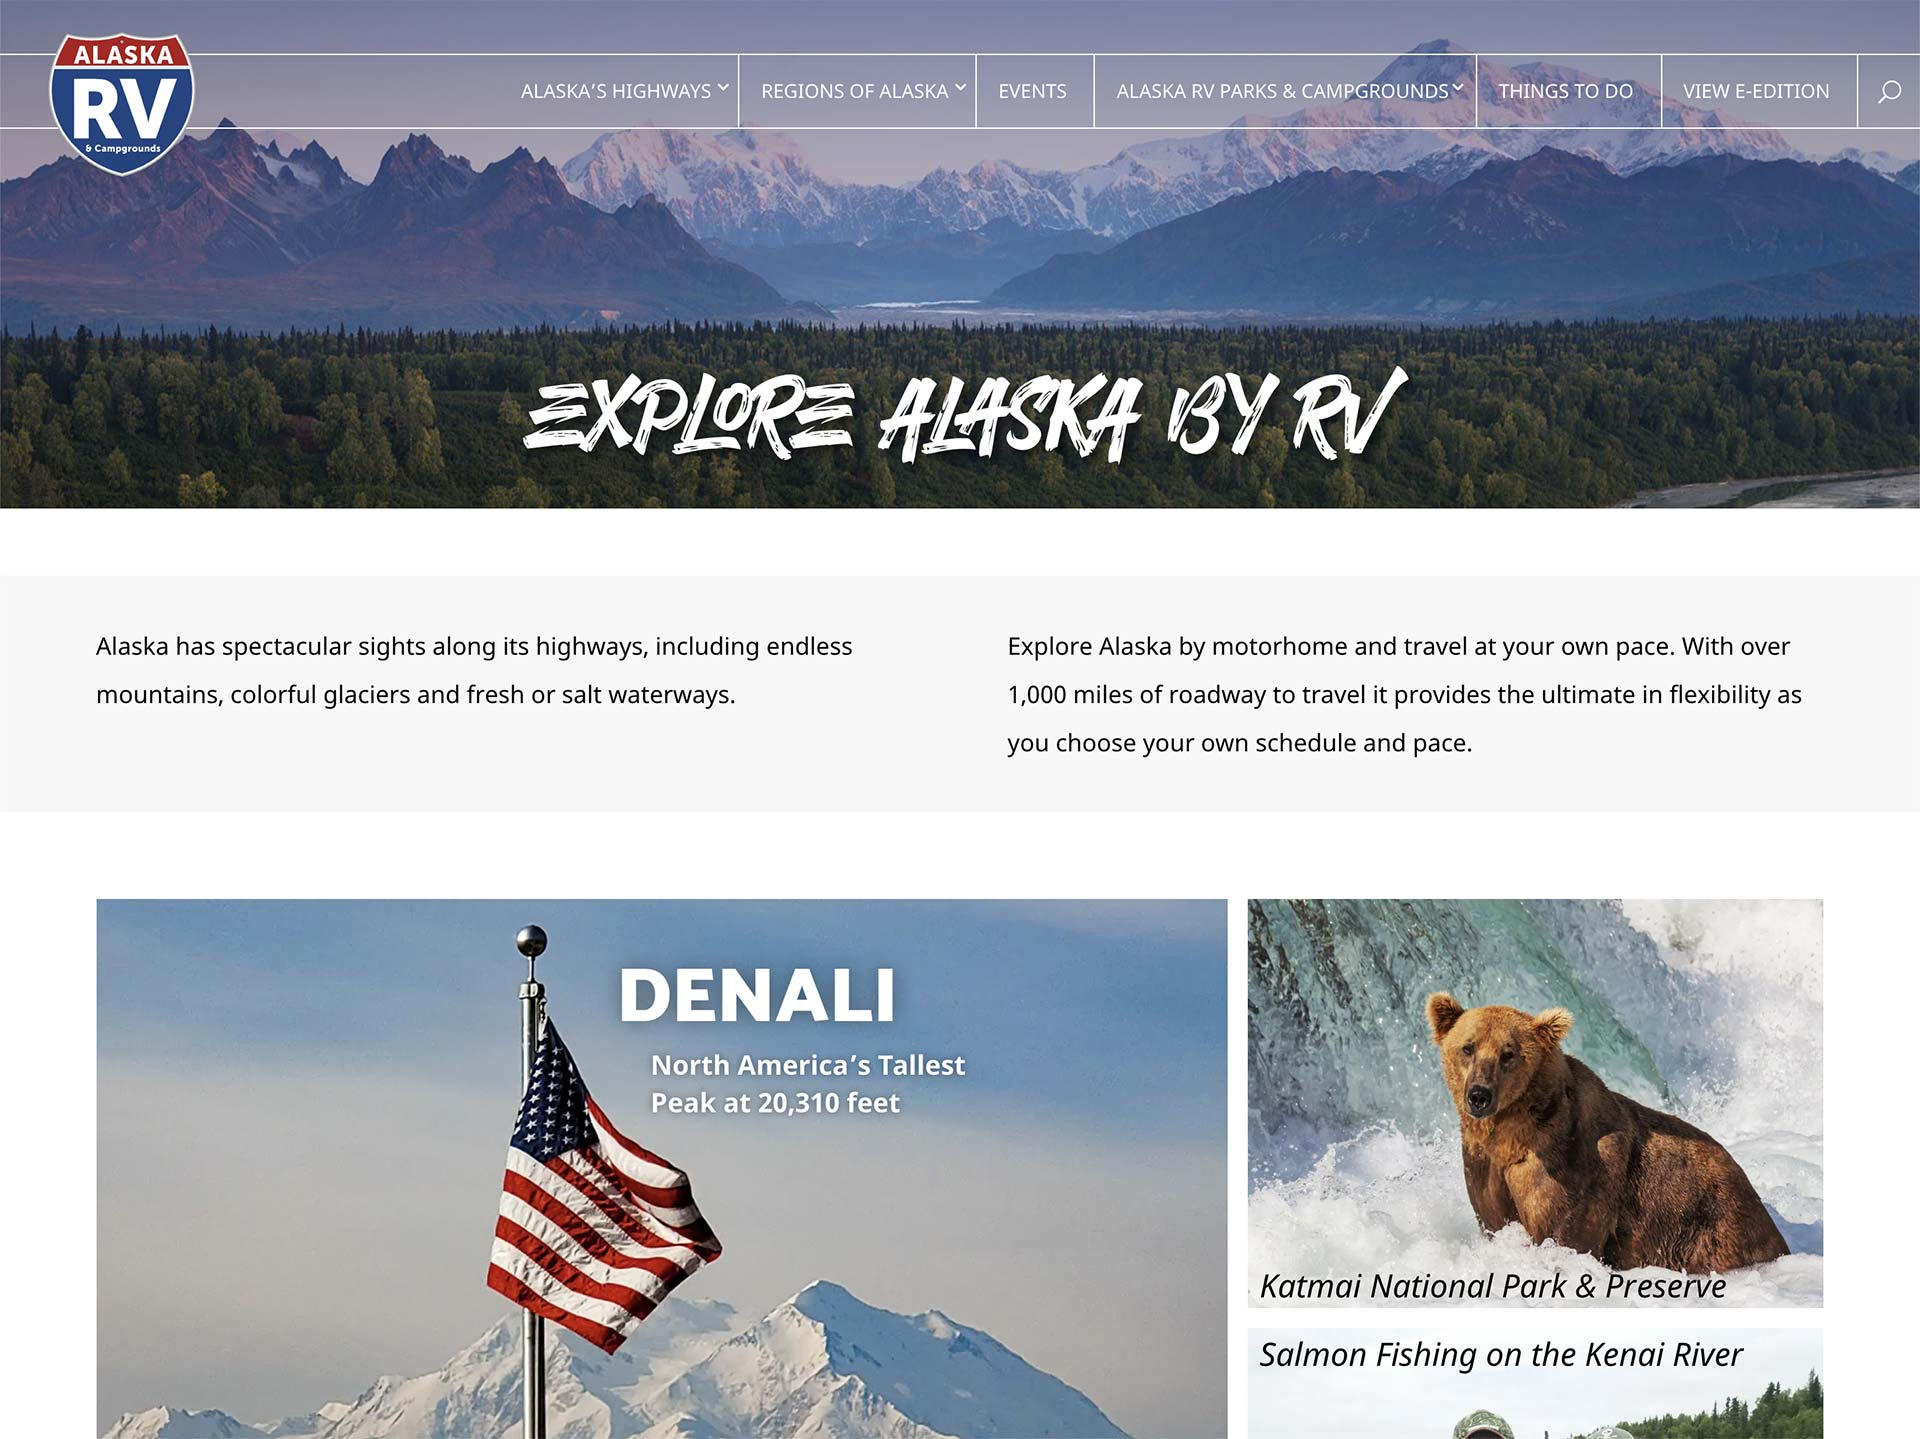 Alaska Information Web Site designed by PR Services Ltd. - Whitehorse Advertising Agency